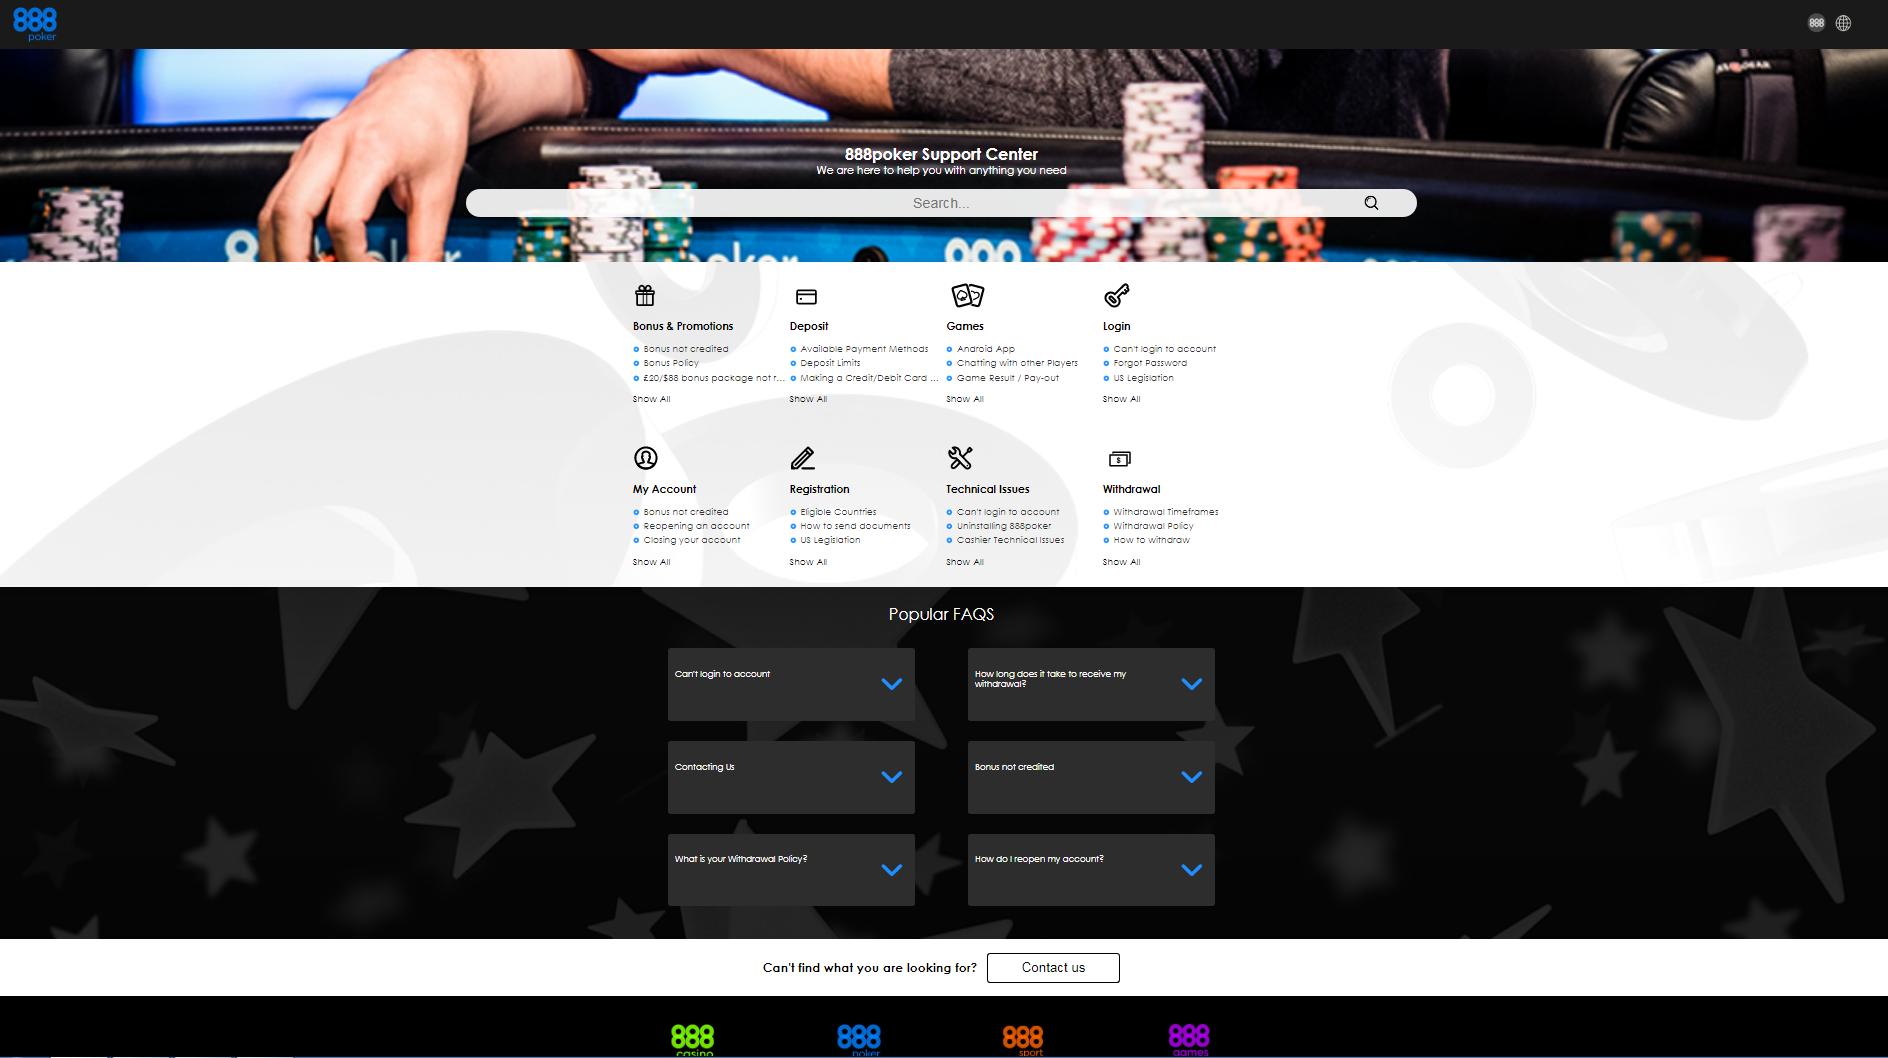 888 poker online help chat